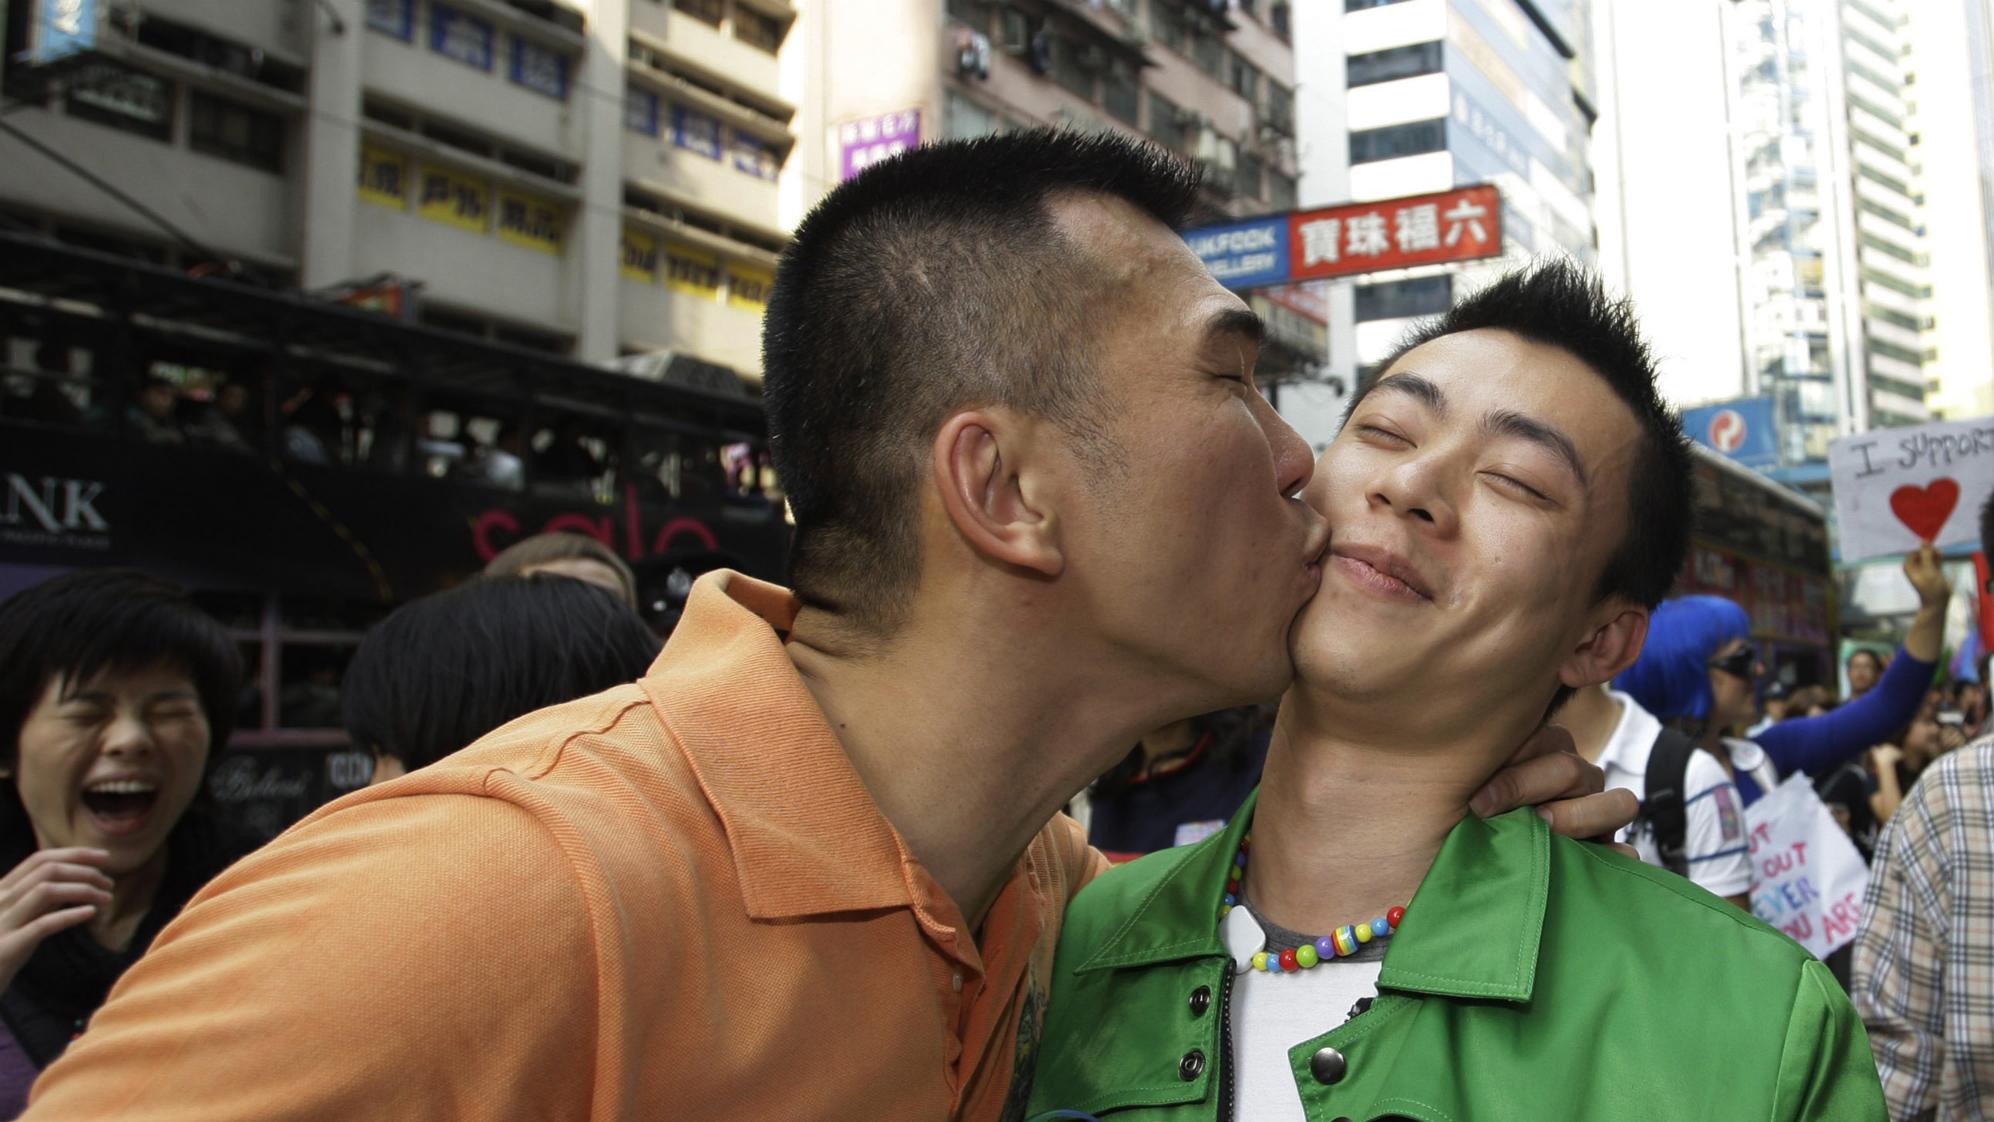 Gay shock collar